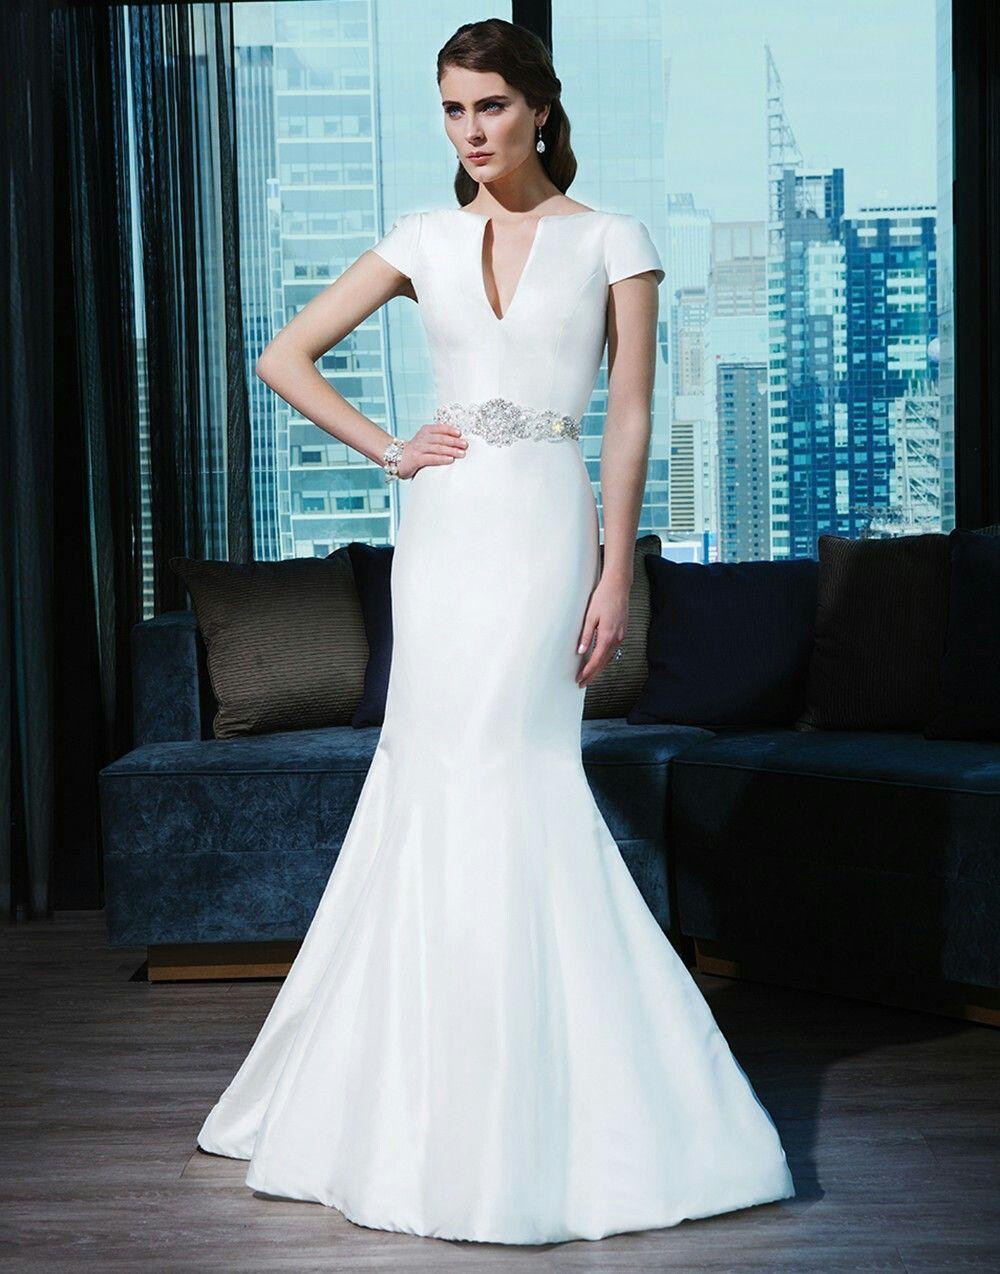 Pin by sandy on wedding dresses pinterest wedding dress and weddings